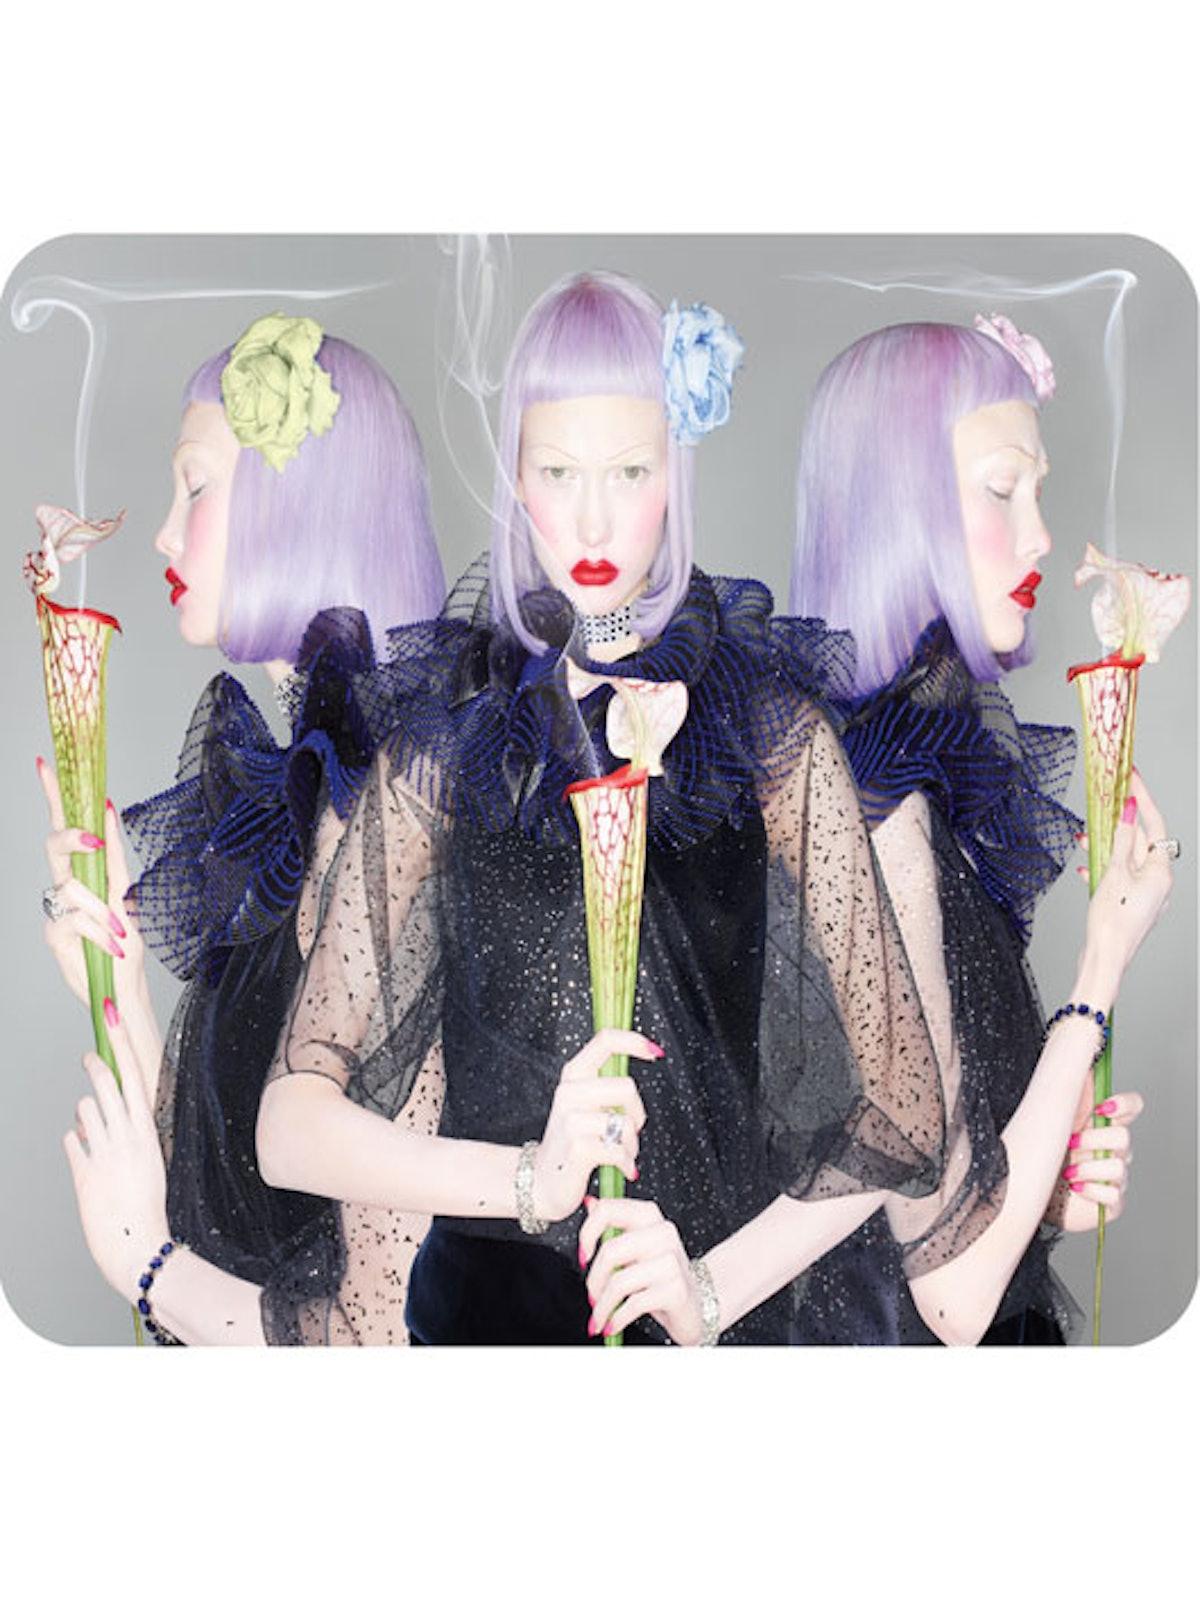 fass-nick-night-couture-05-l.jpg